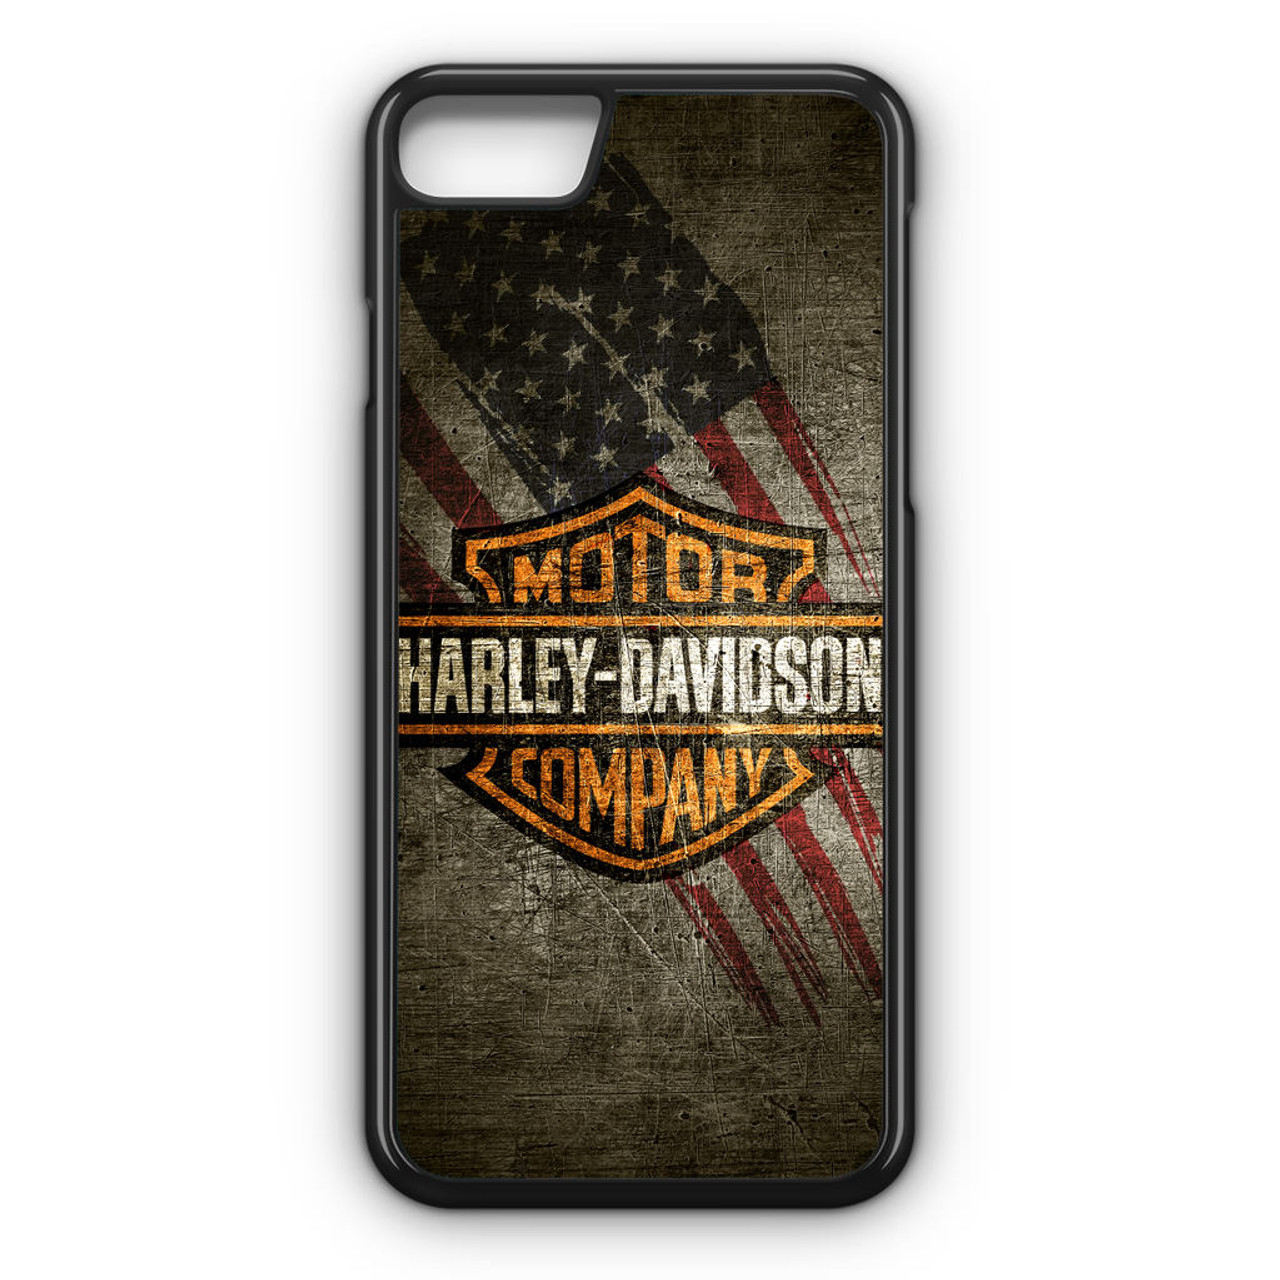 iphone 8 case harley davidson